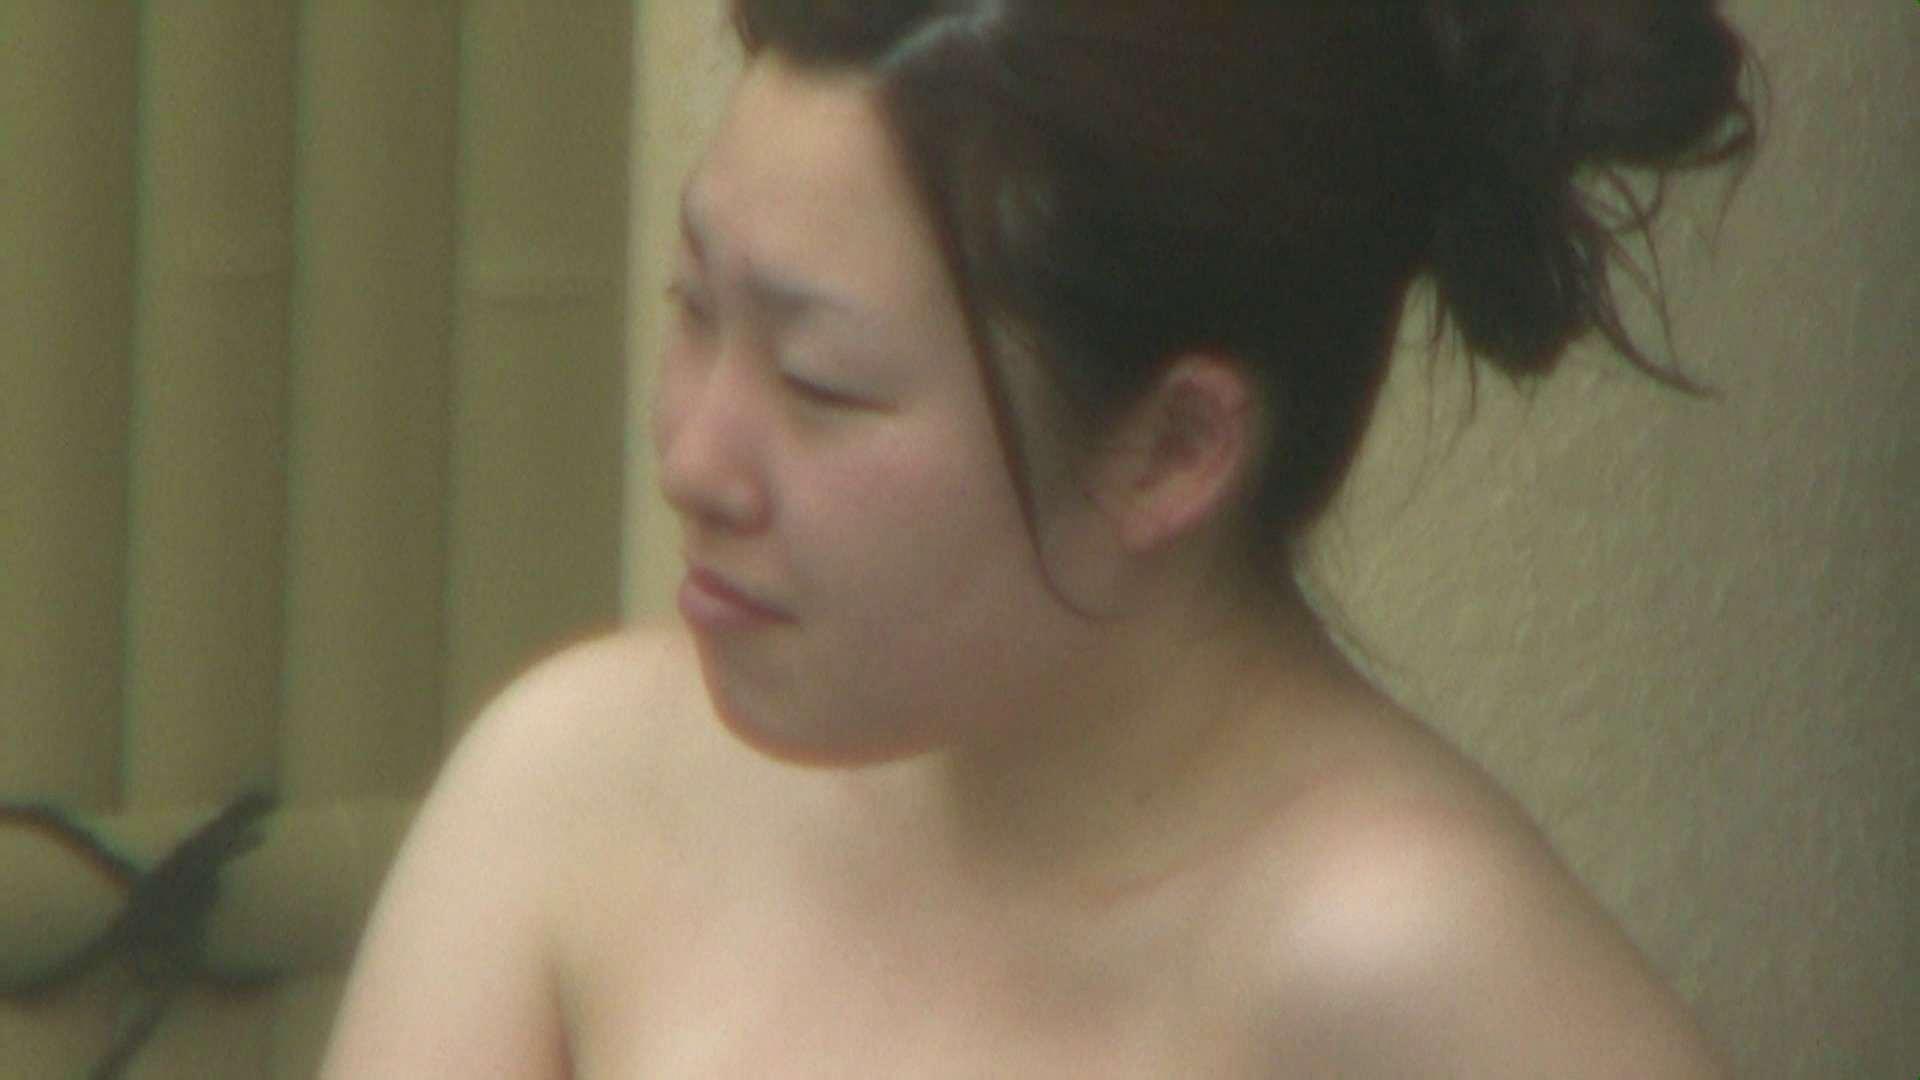 Aquaな露天風呂Vol.72【VIP限定】 露天風呂突入 | 盗撮師作品  76pic 73